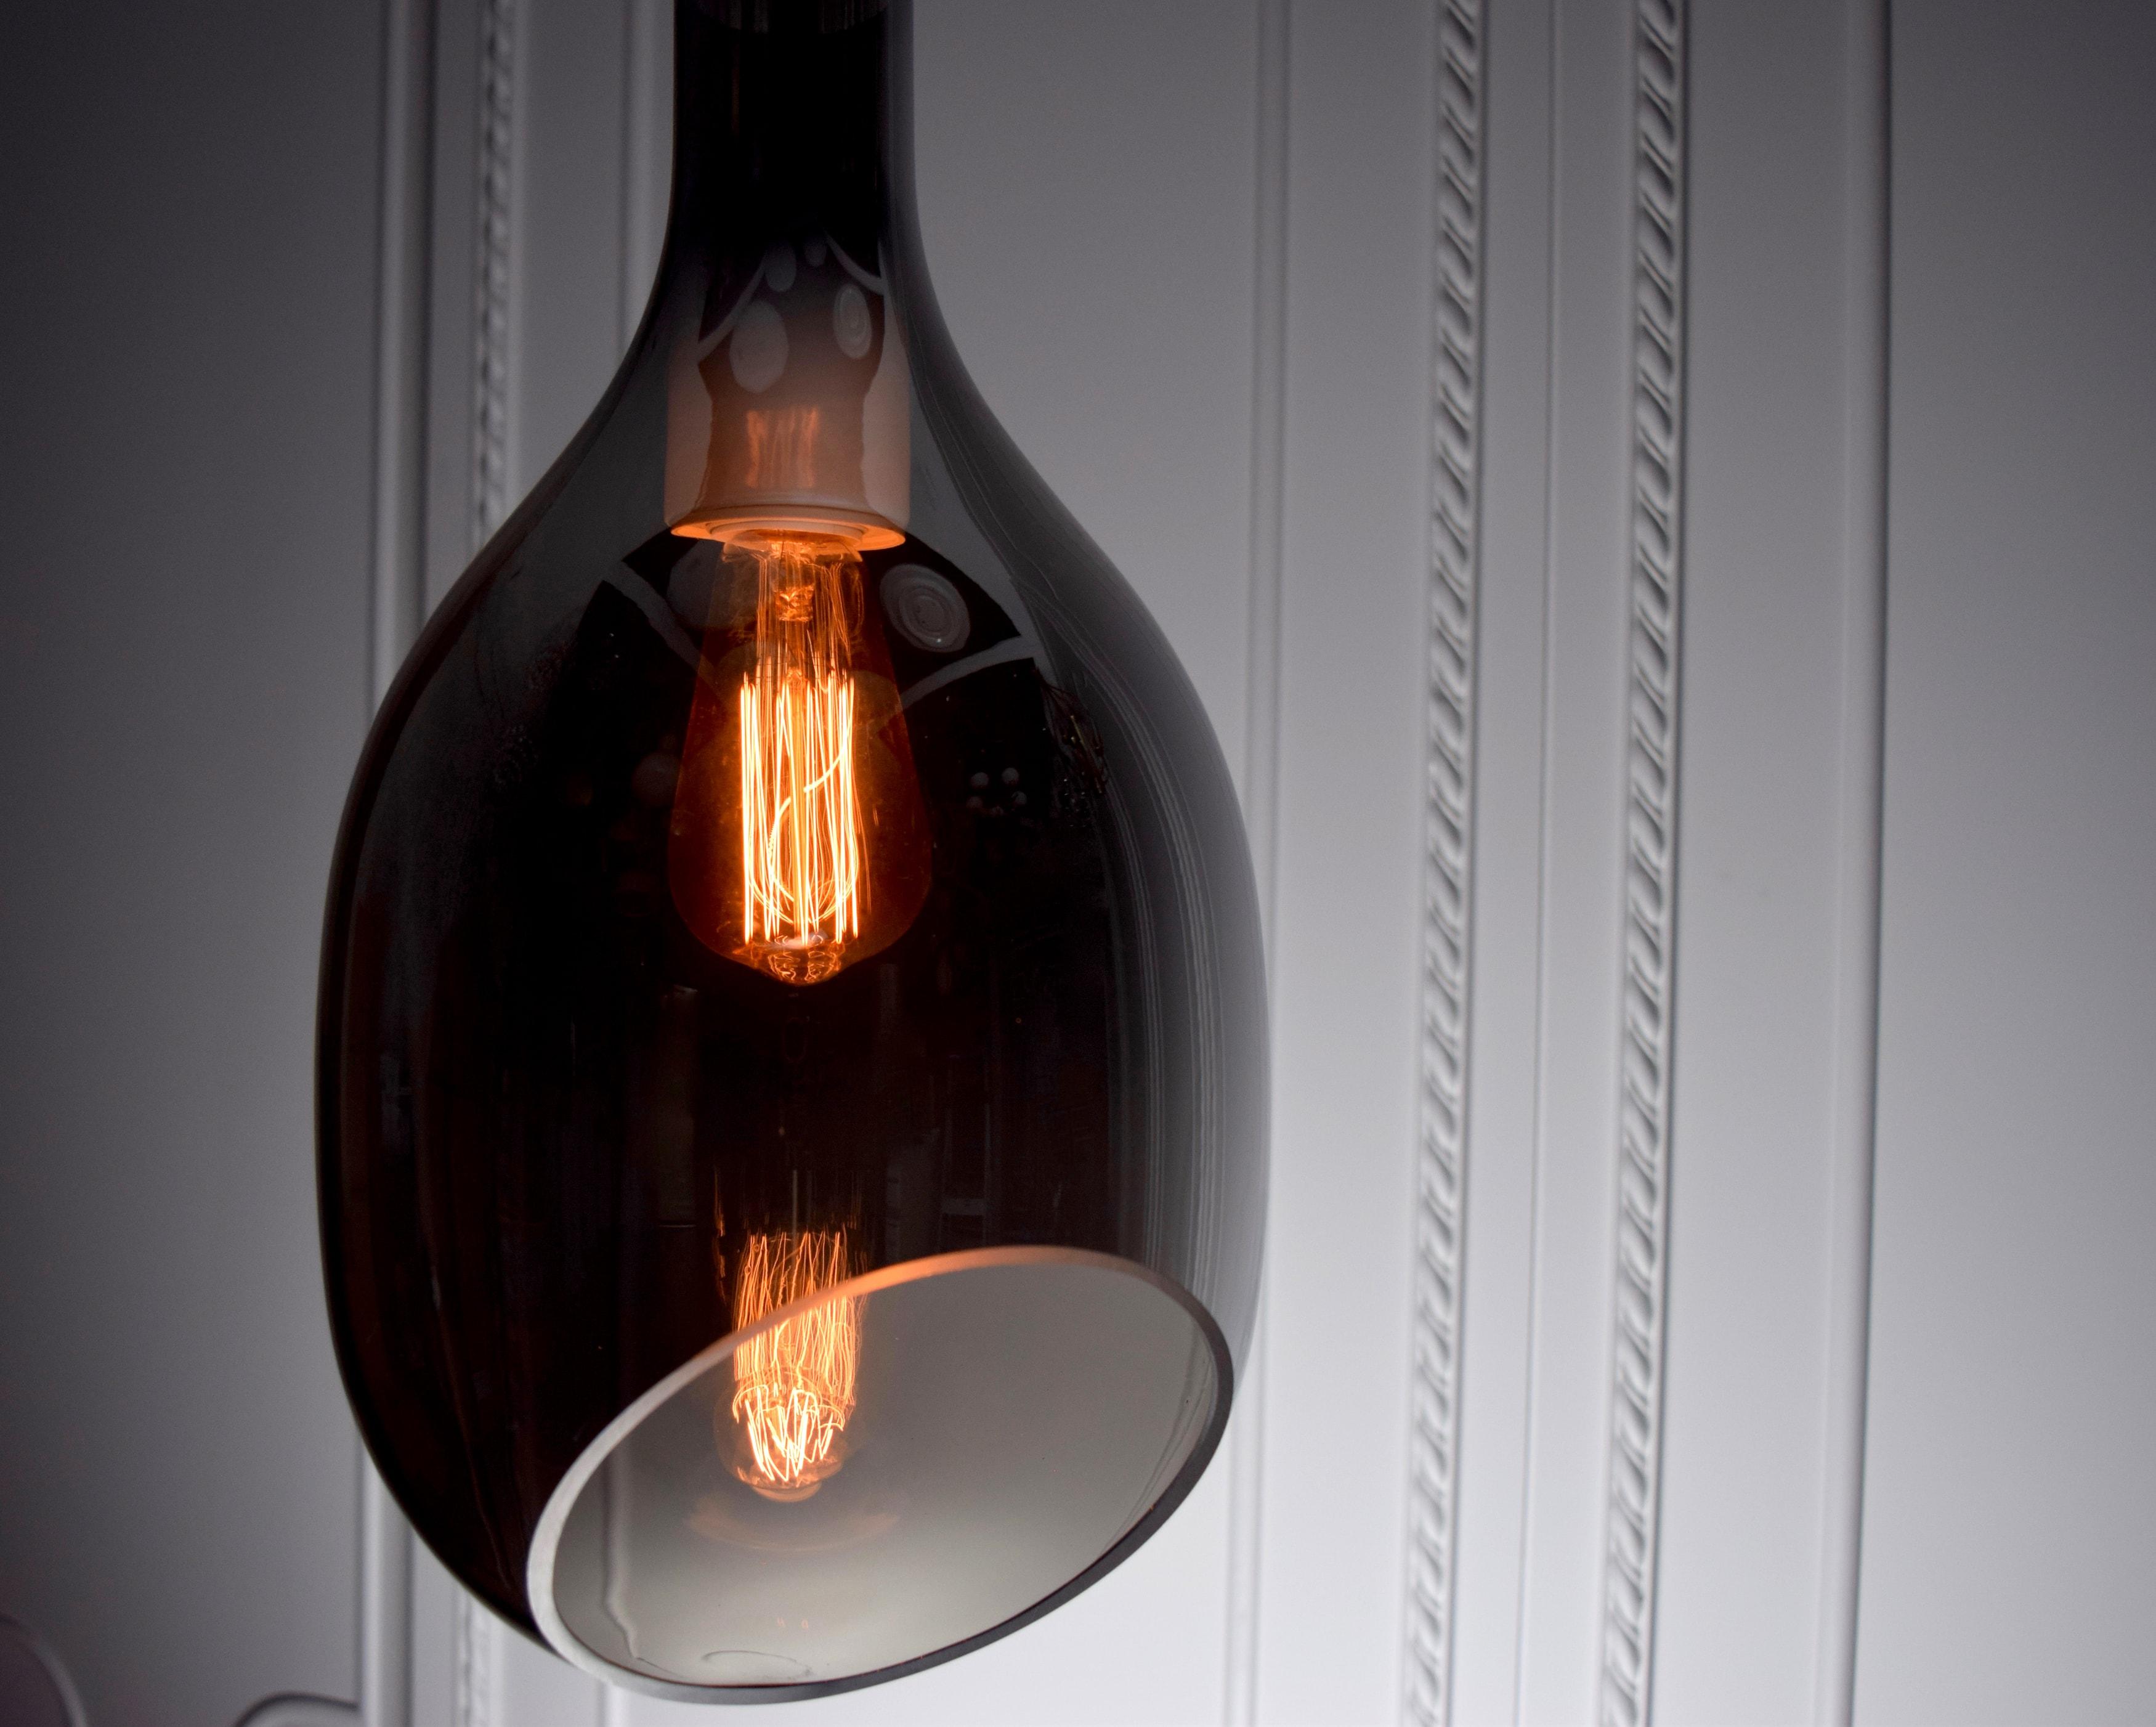 VESSEL 斜口玻璃煙灰色吊燈-BNL00127 4